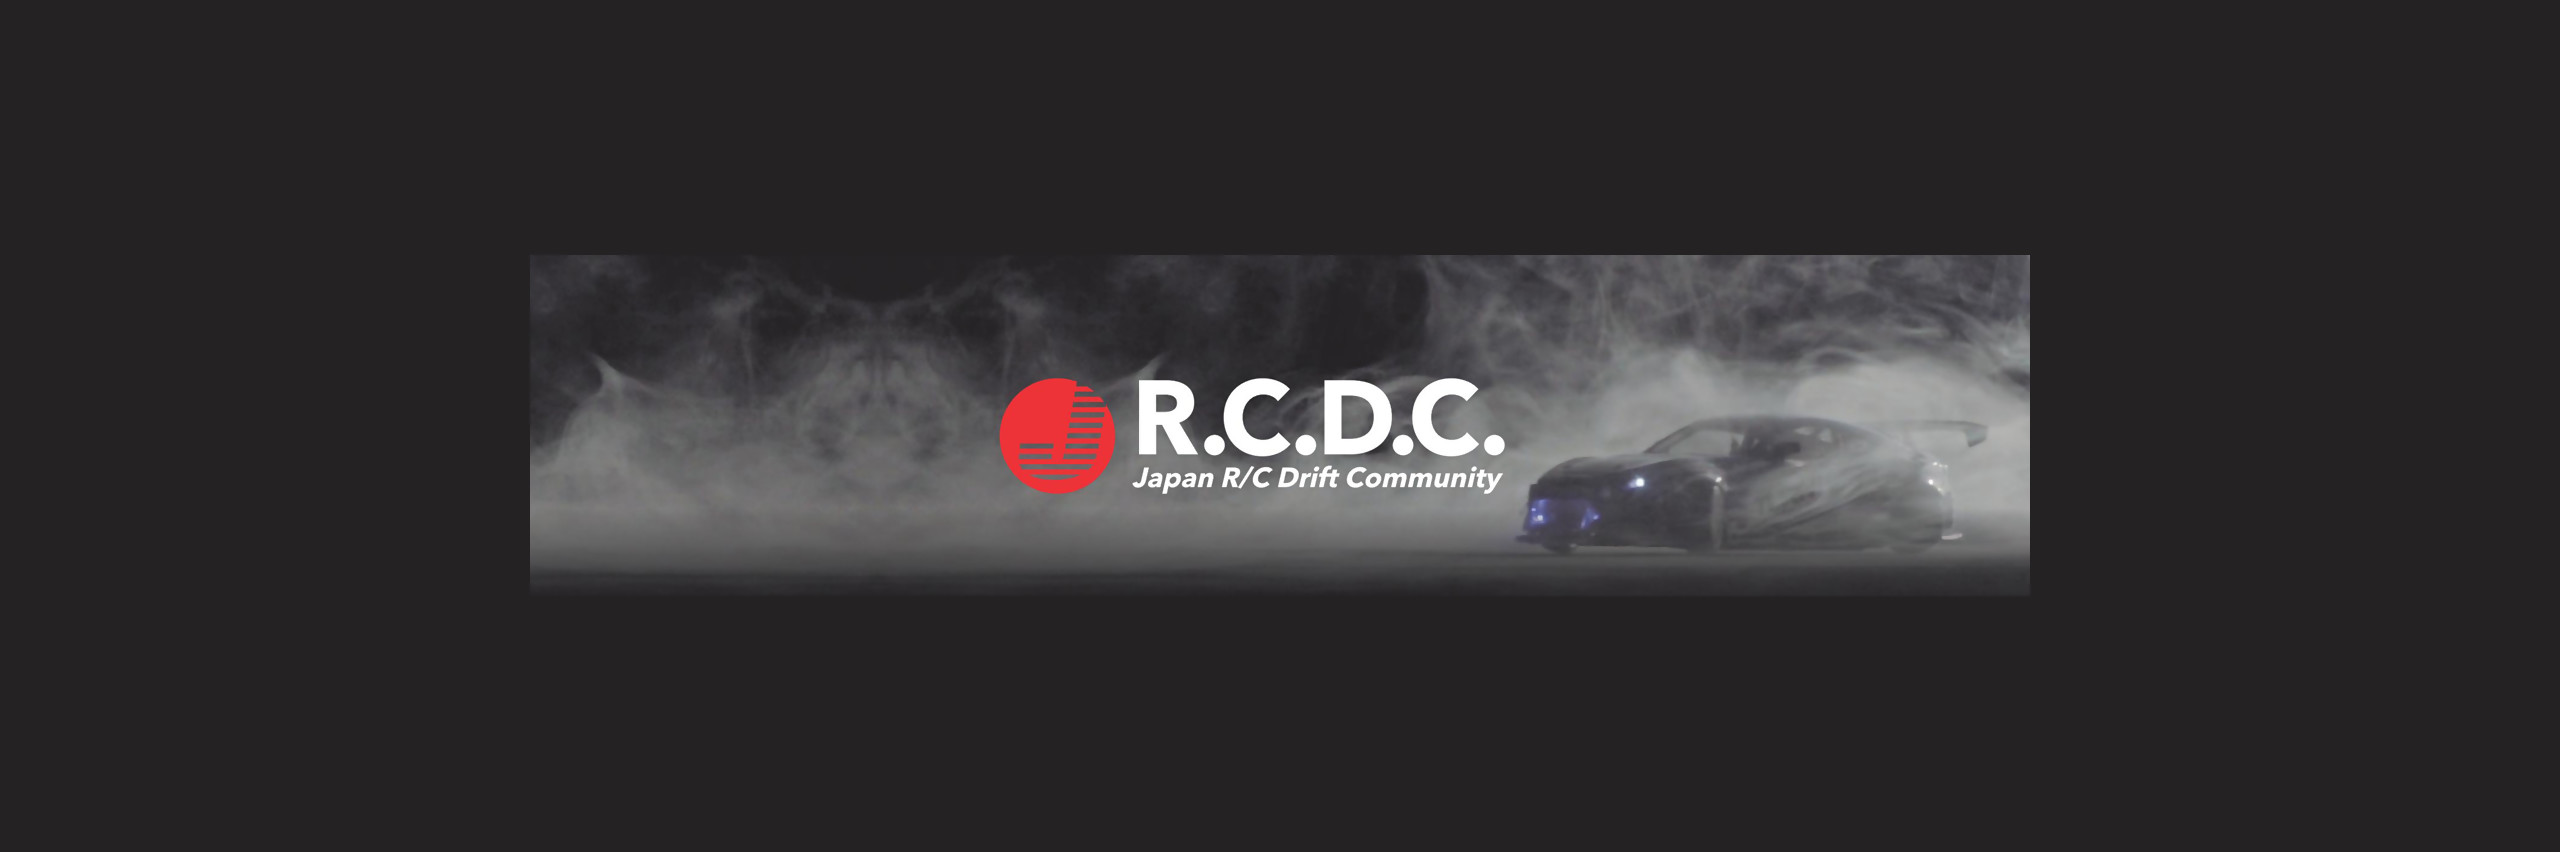 R.C.D.C全日本RCドリフト競技委員会